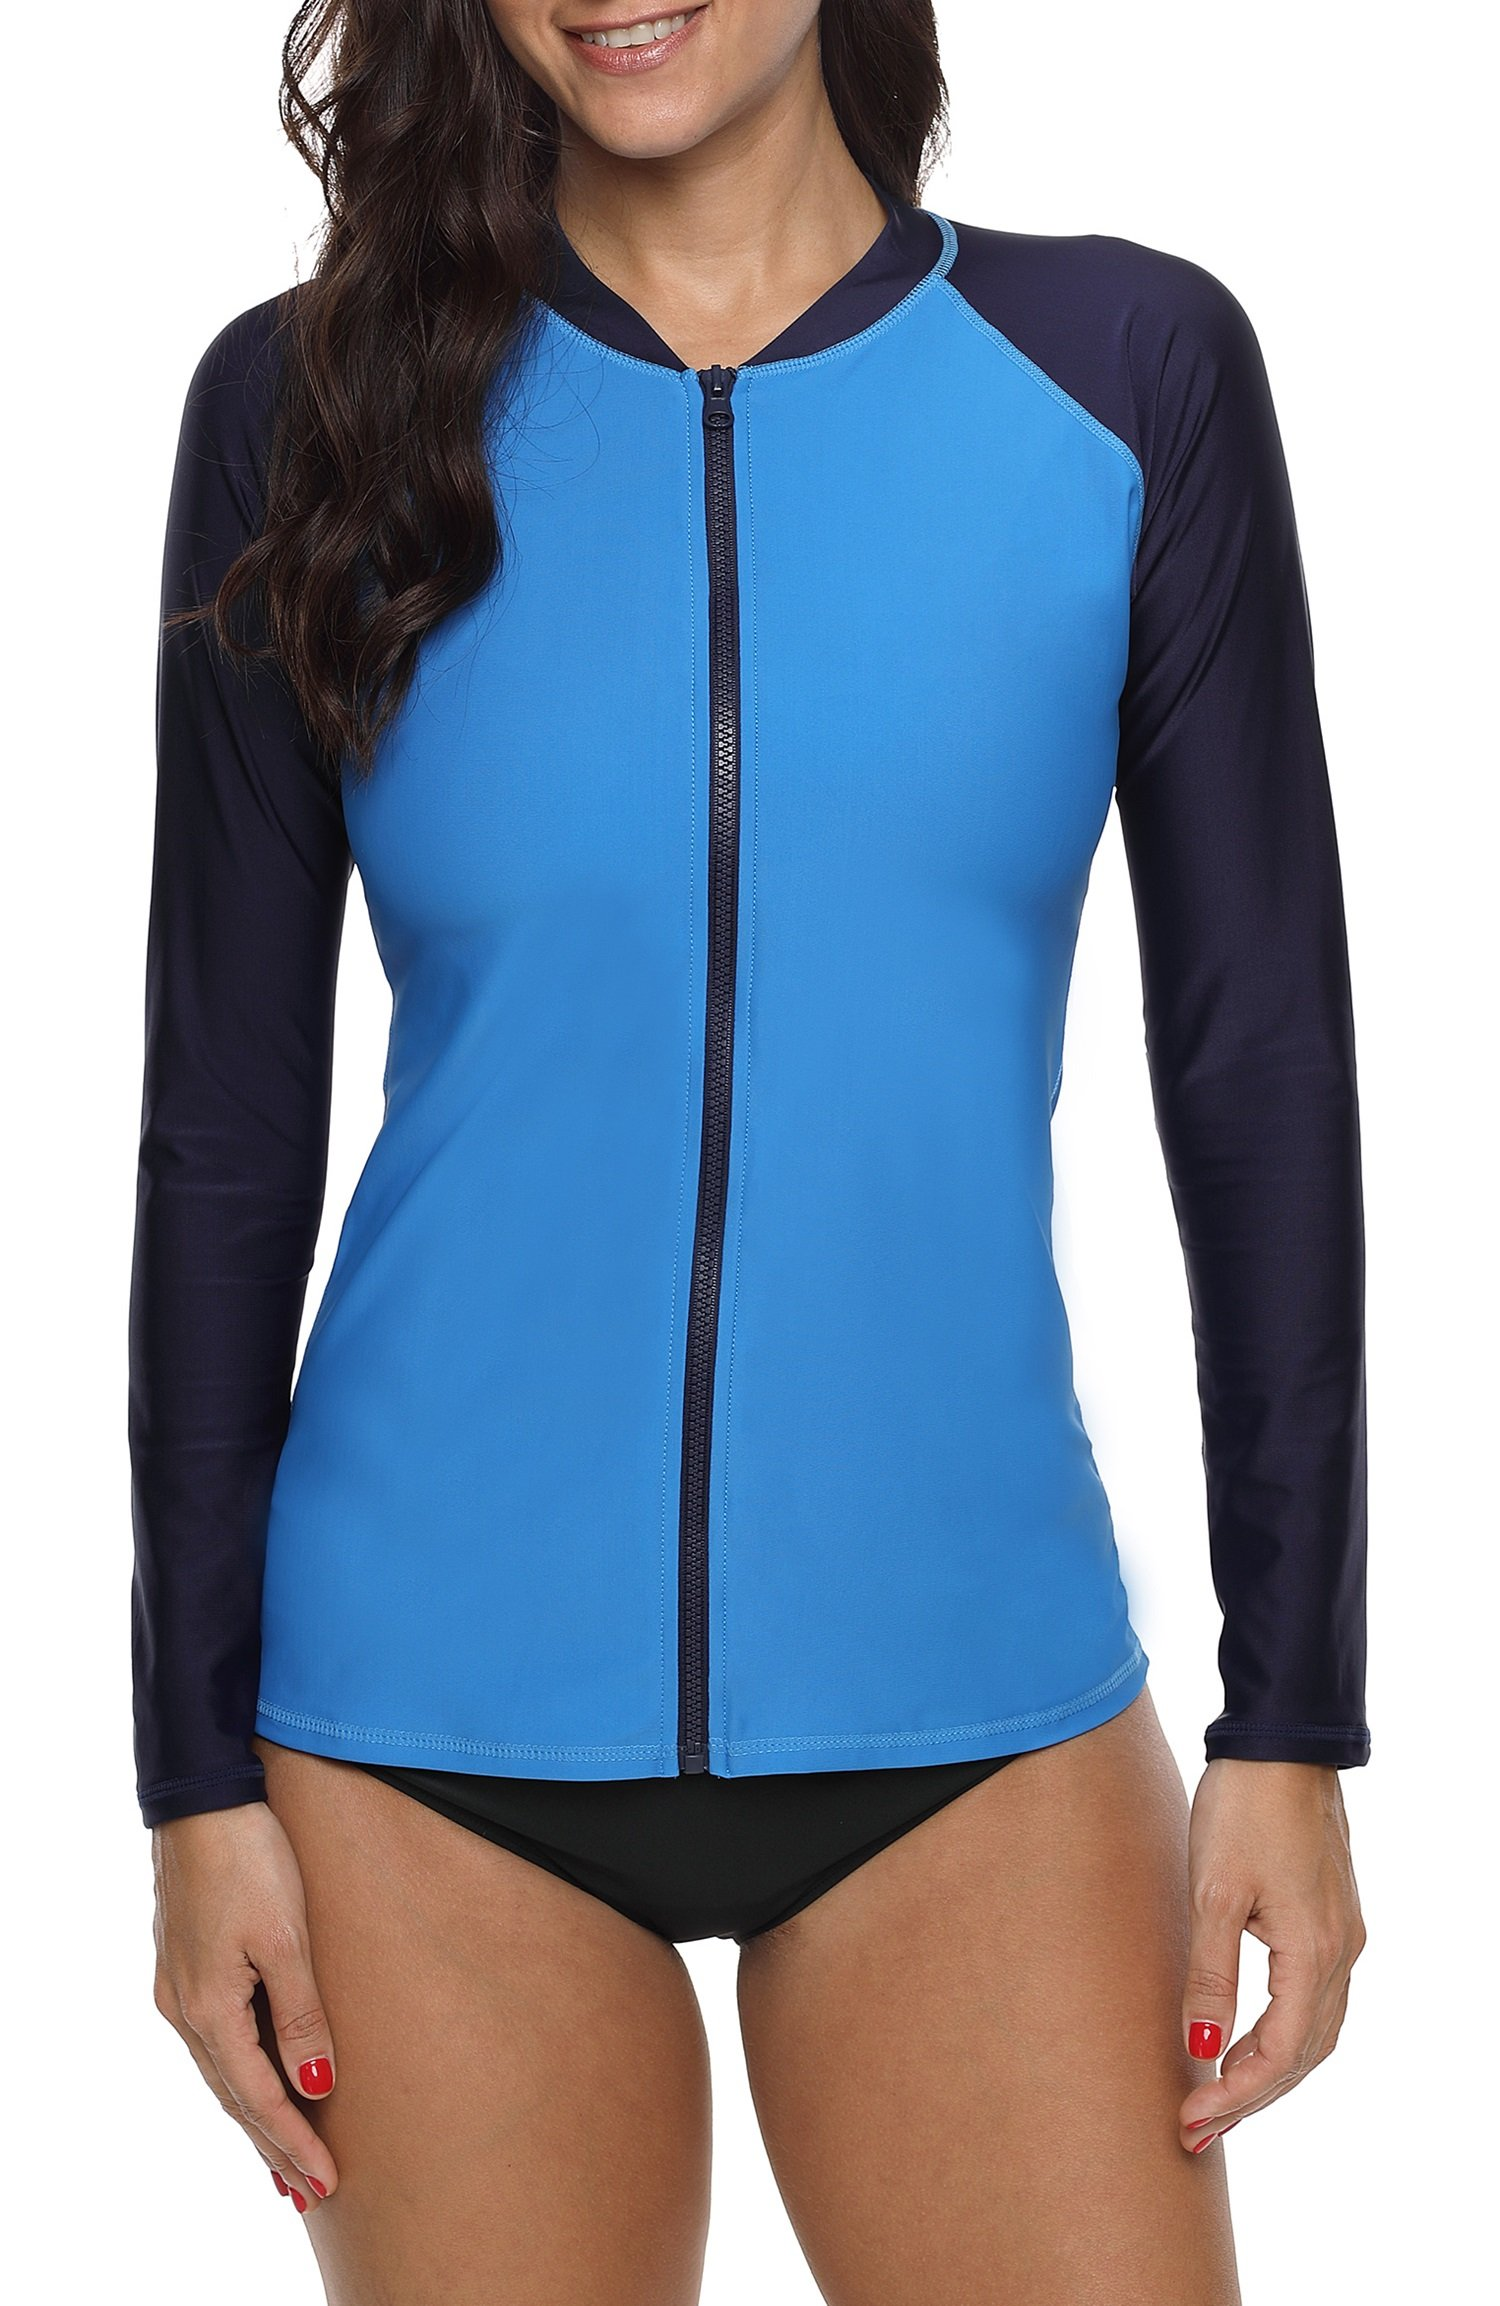 ATTRACO Womens Rash Guard Top Zip Long Raglan Sleeve Swim Shirt Royal Medium